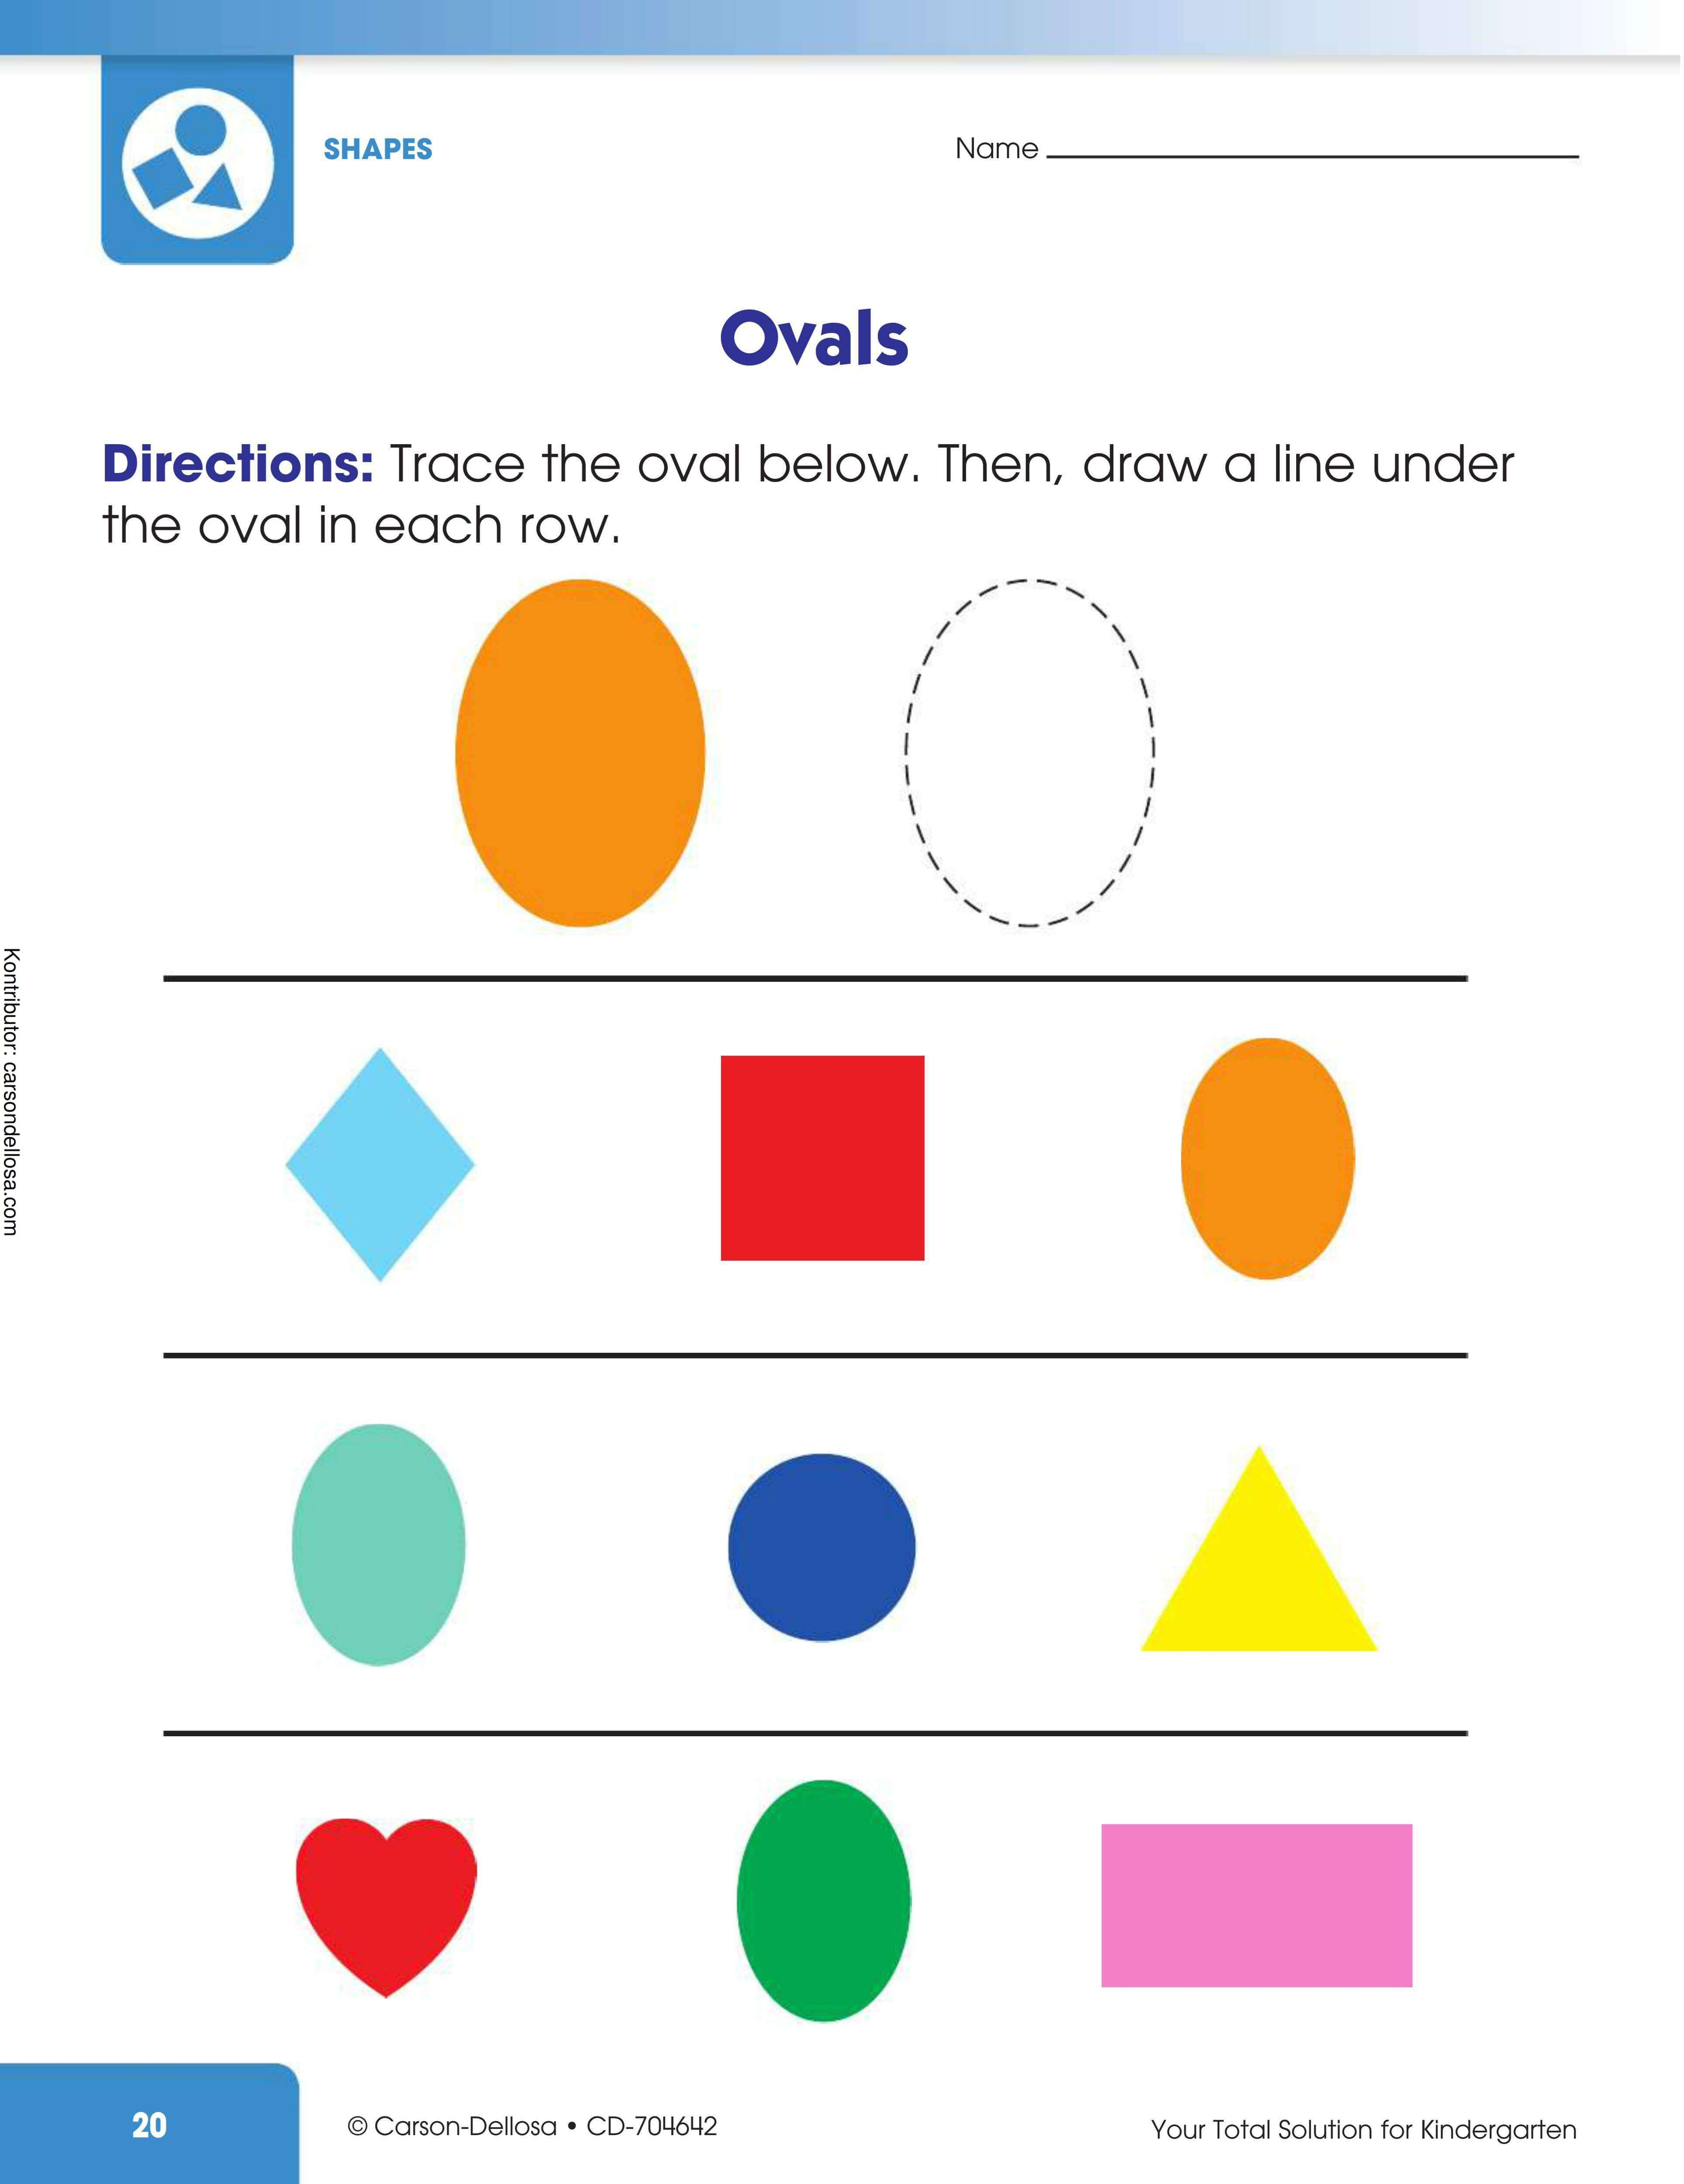 Belajar Mengenal dan Menggambar Benda Berbentuk Ovals